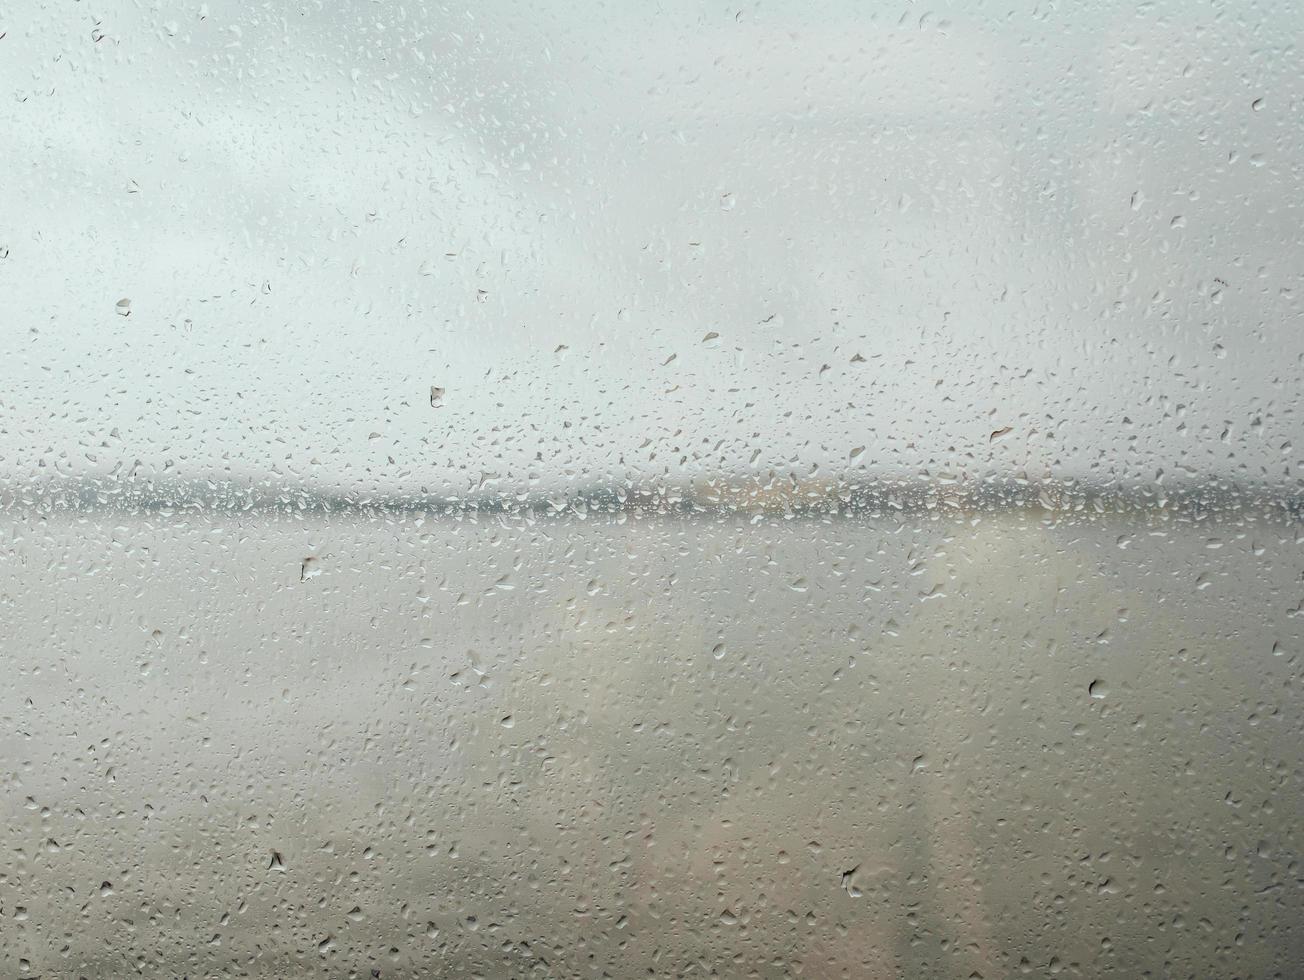 vattendroppar på glas foto